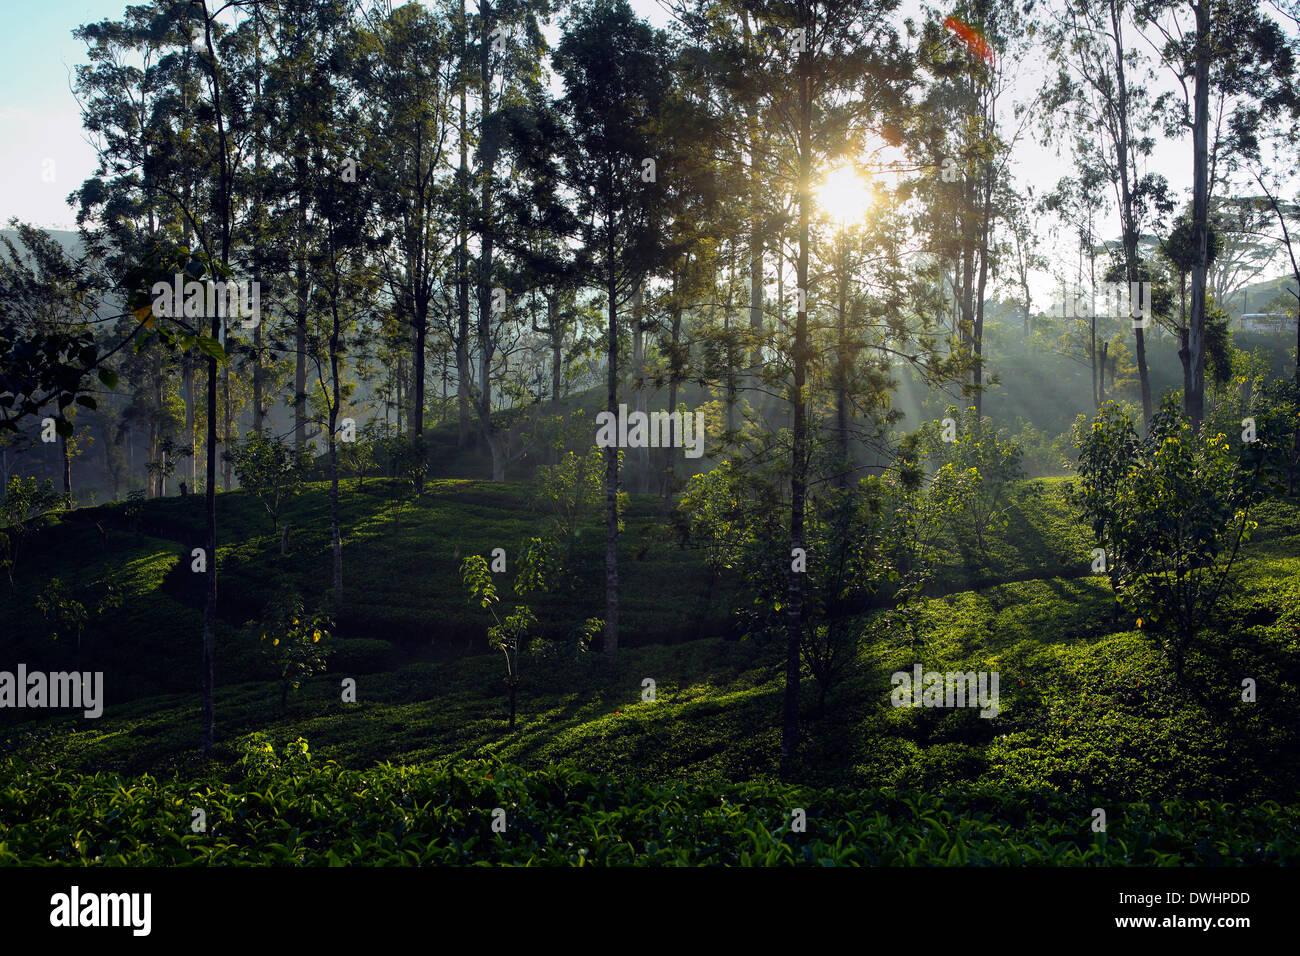 Early morning sun shining through trees in tea estate near Maskeliya in the Sri Lanka highlands - Stock Image